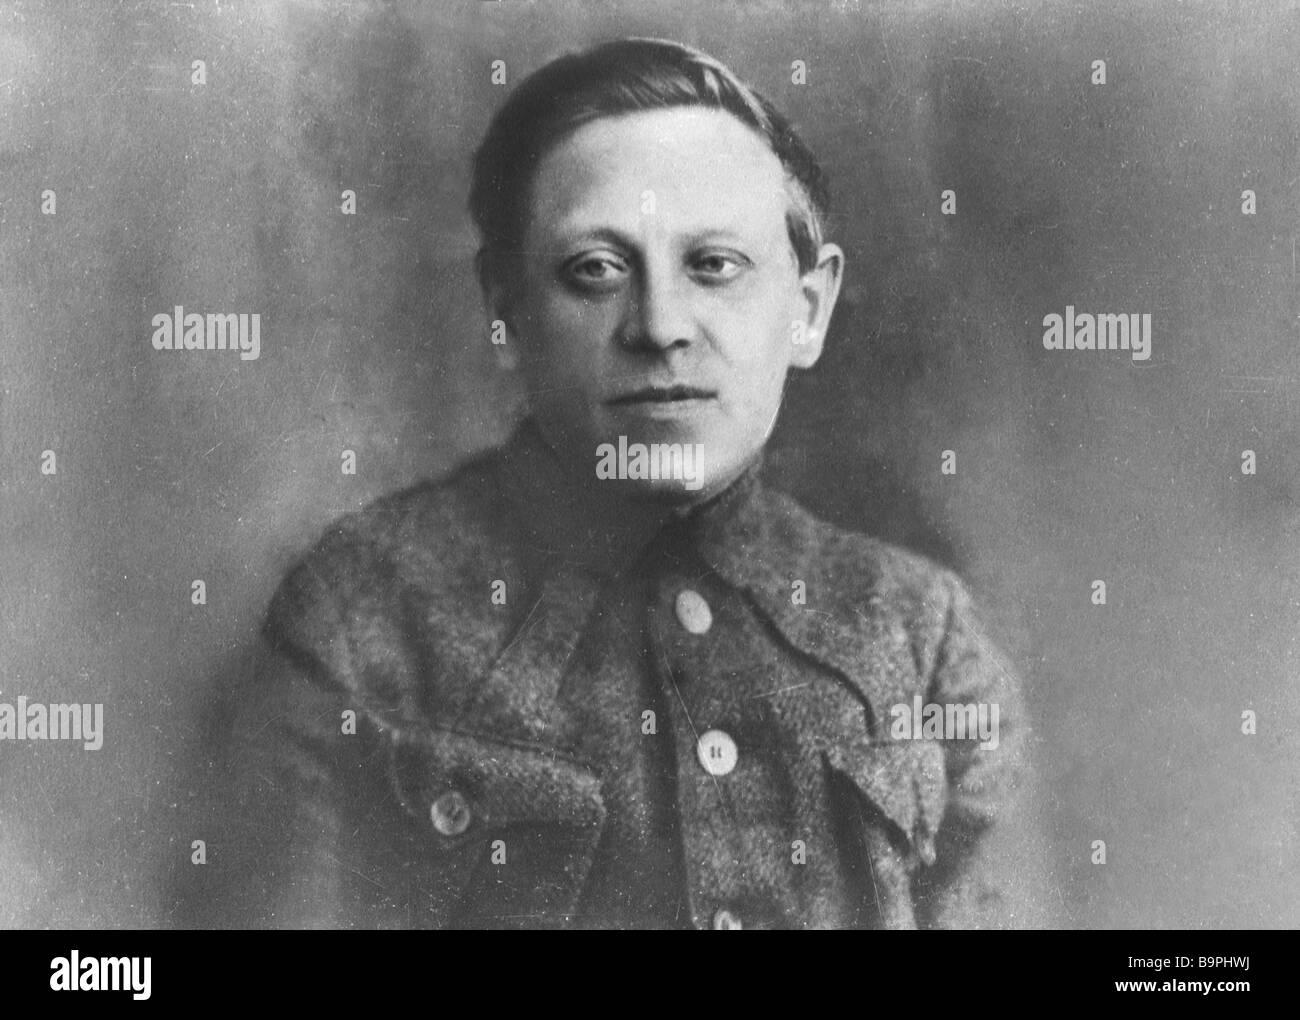 Symon Petlyura 1879 1926 - Stock Image